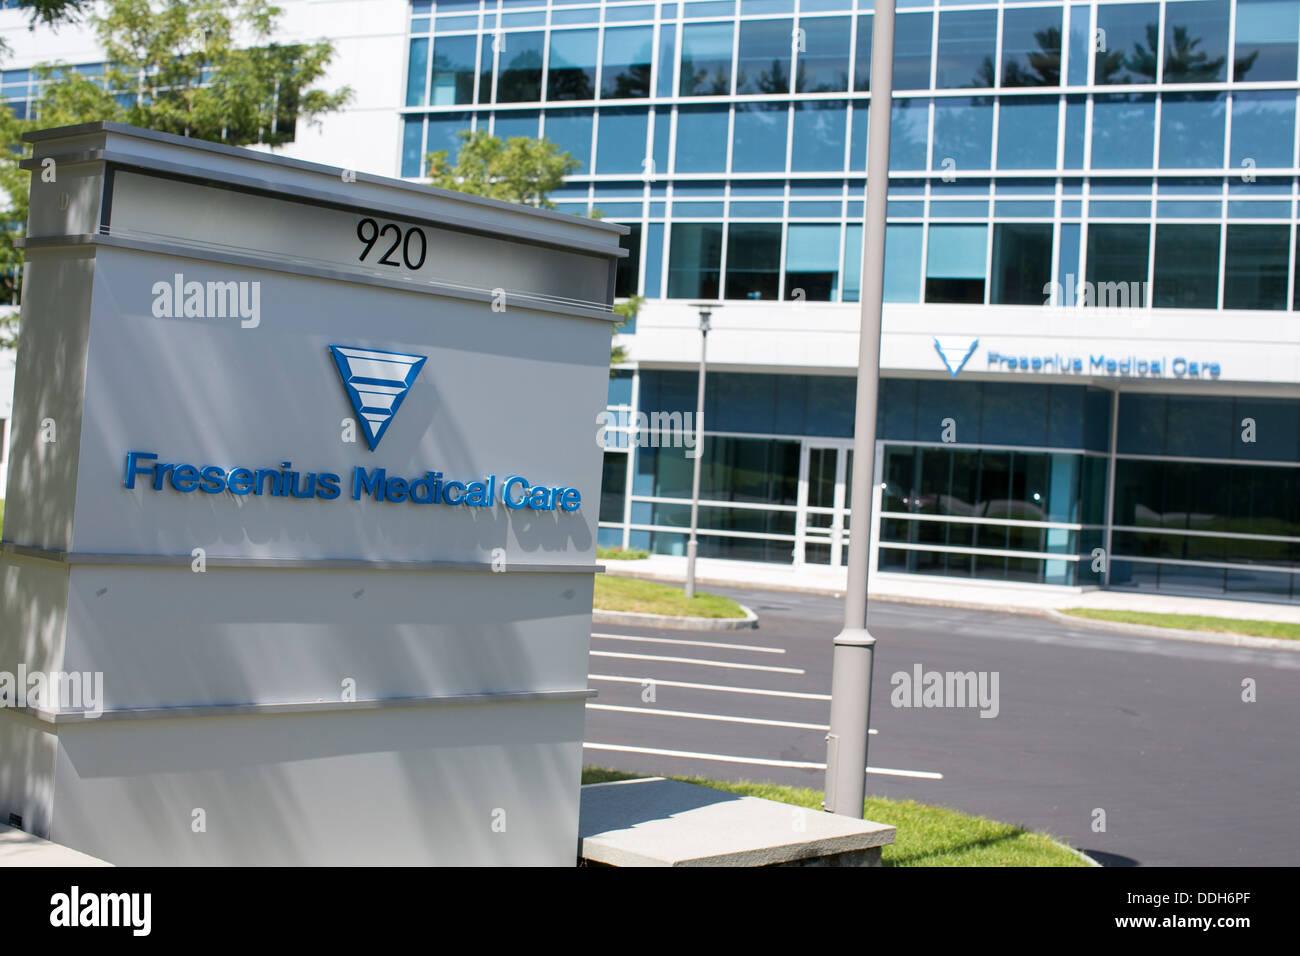 The headquarters of Fresenius Medical Care North America. - Stock Image